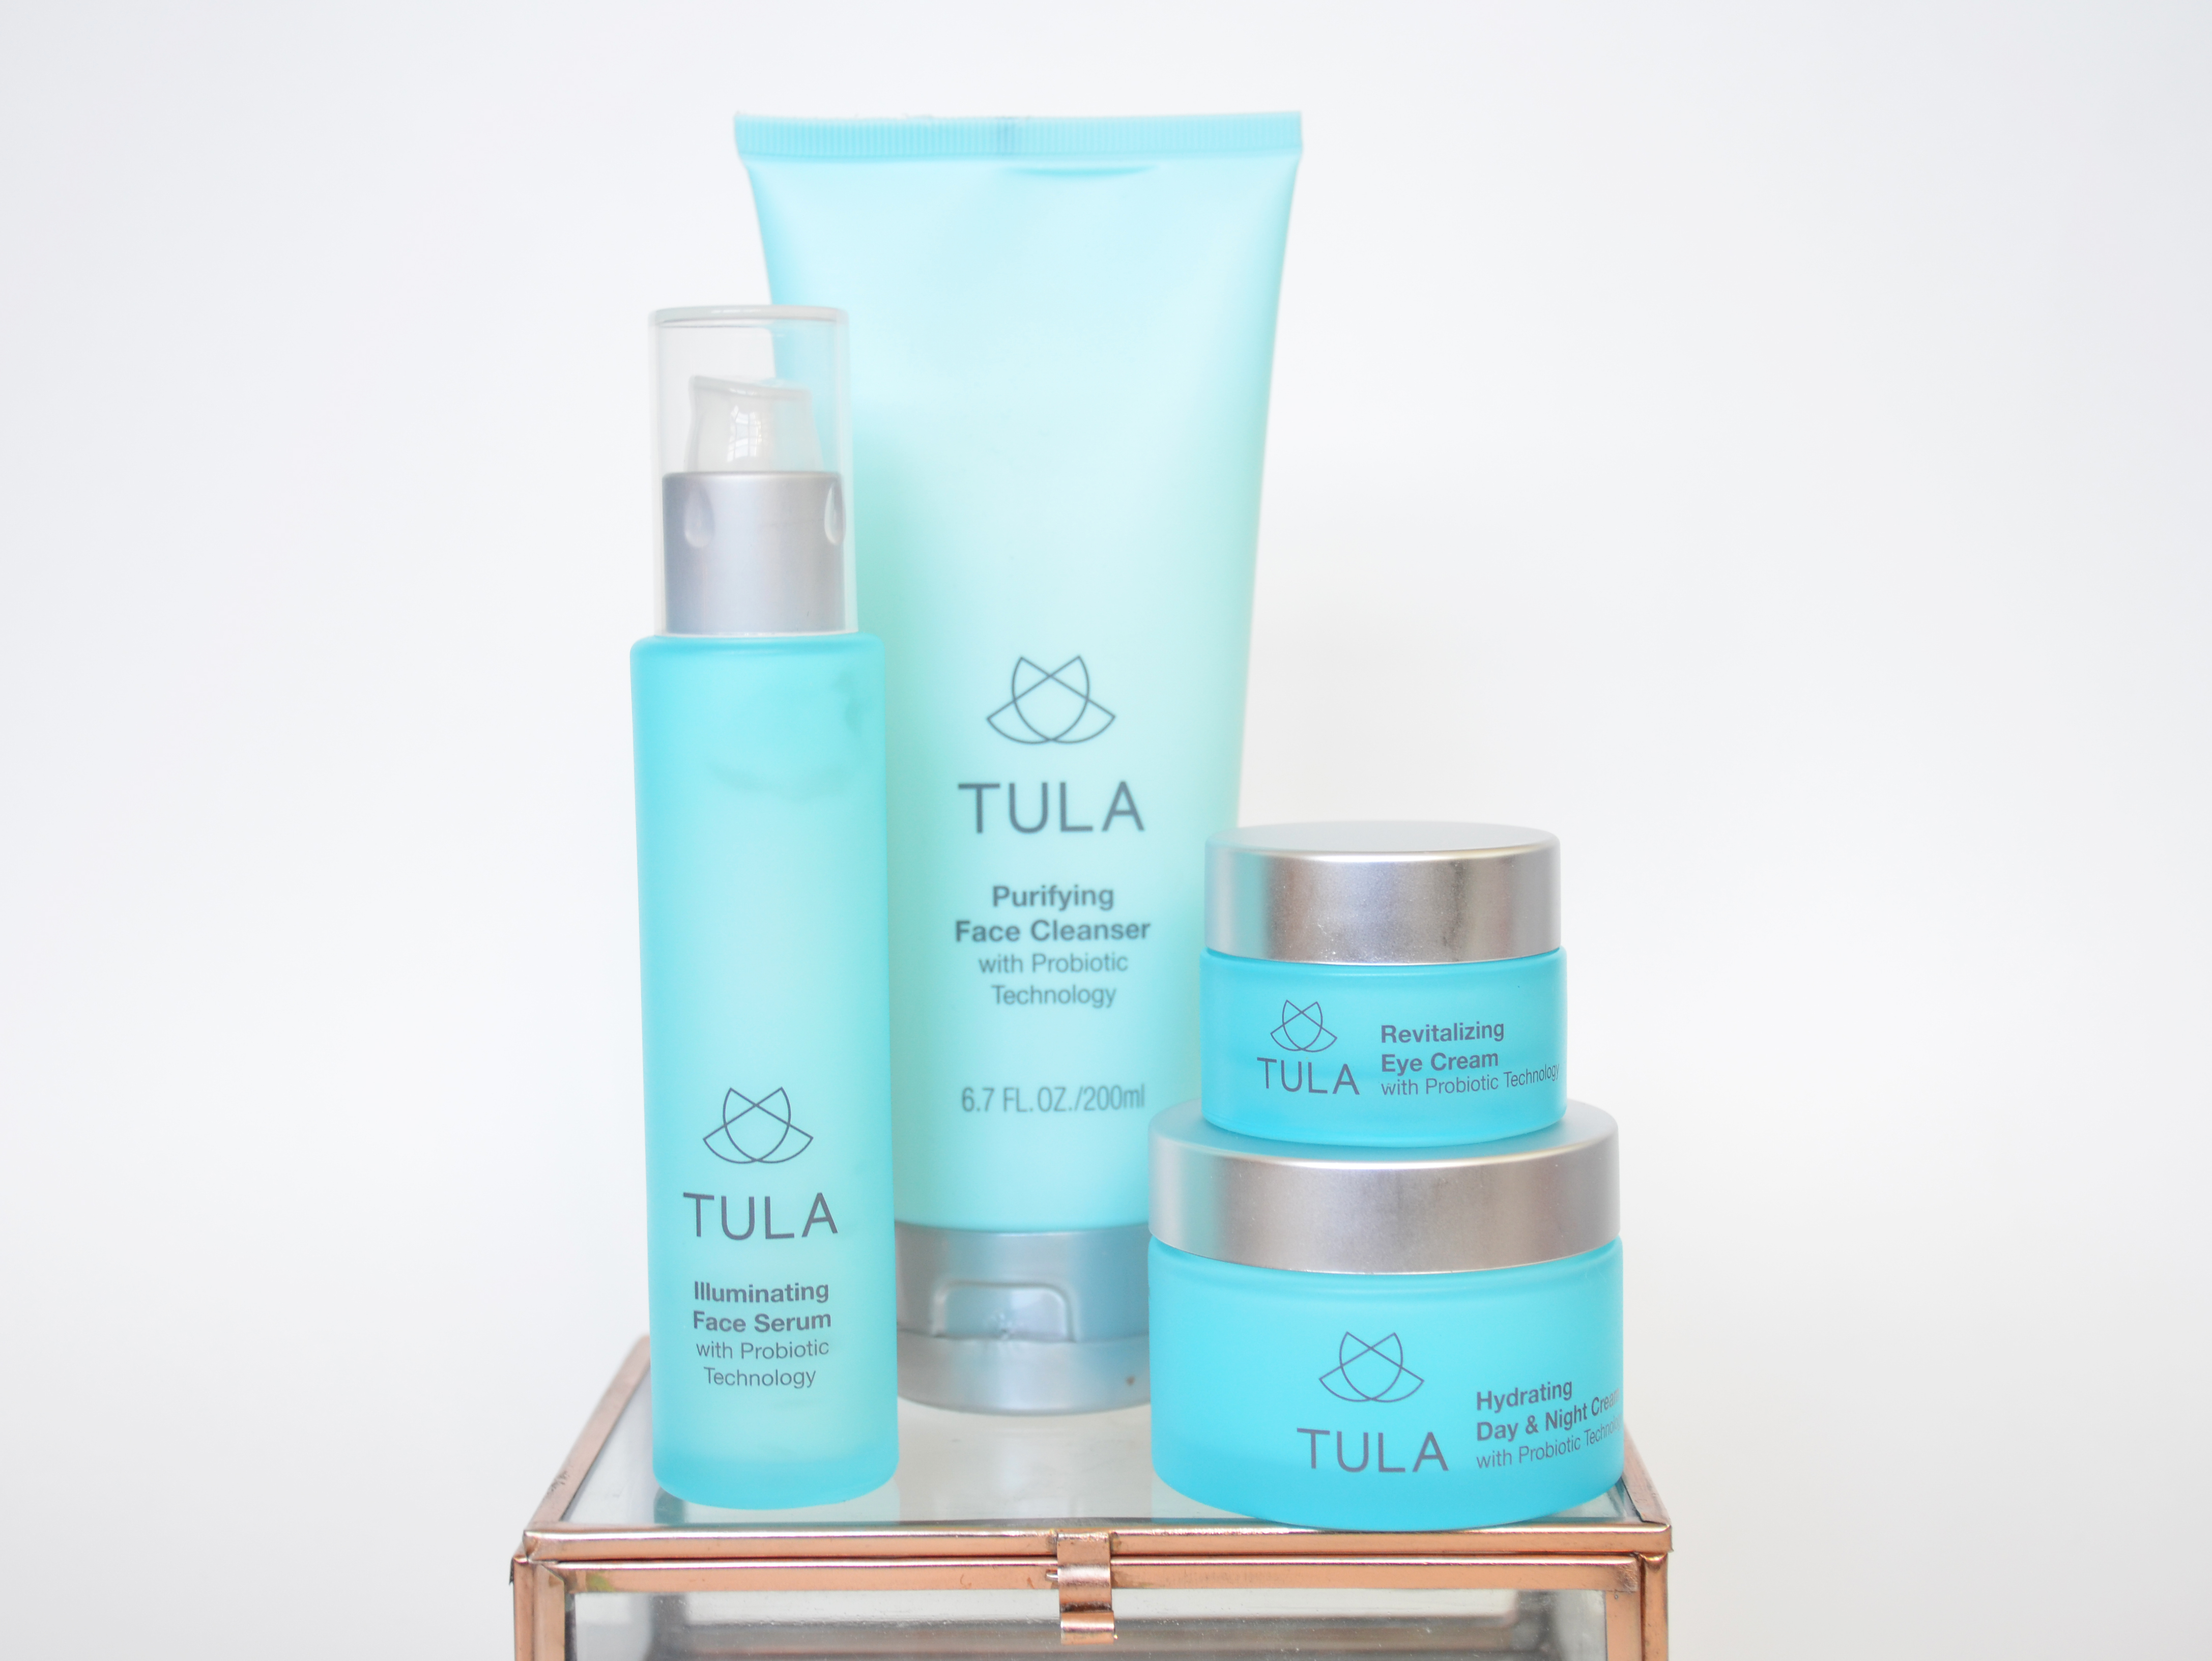 24-7 Moisture Hydrating Day & Night Cream by Tula #11